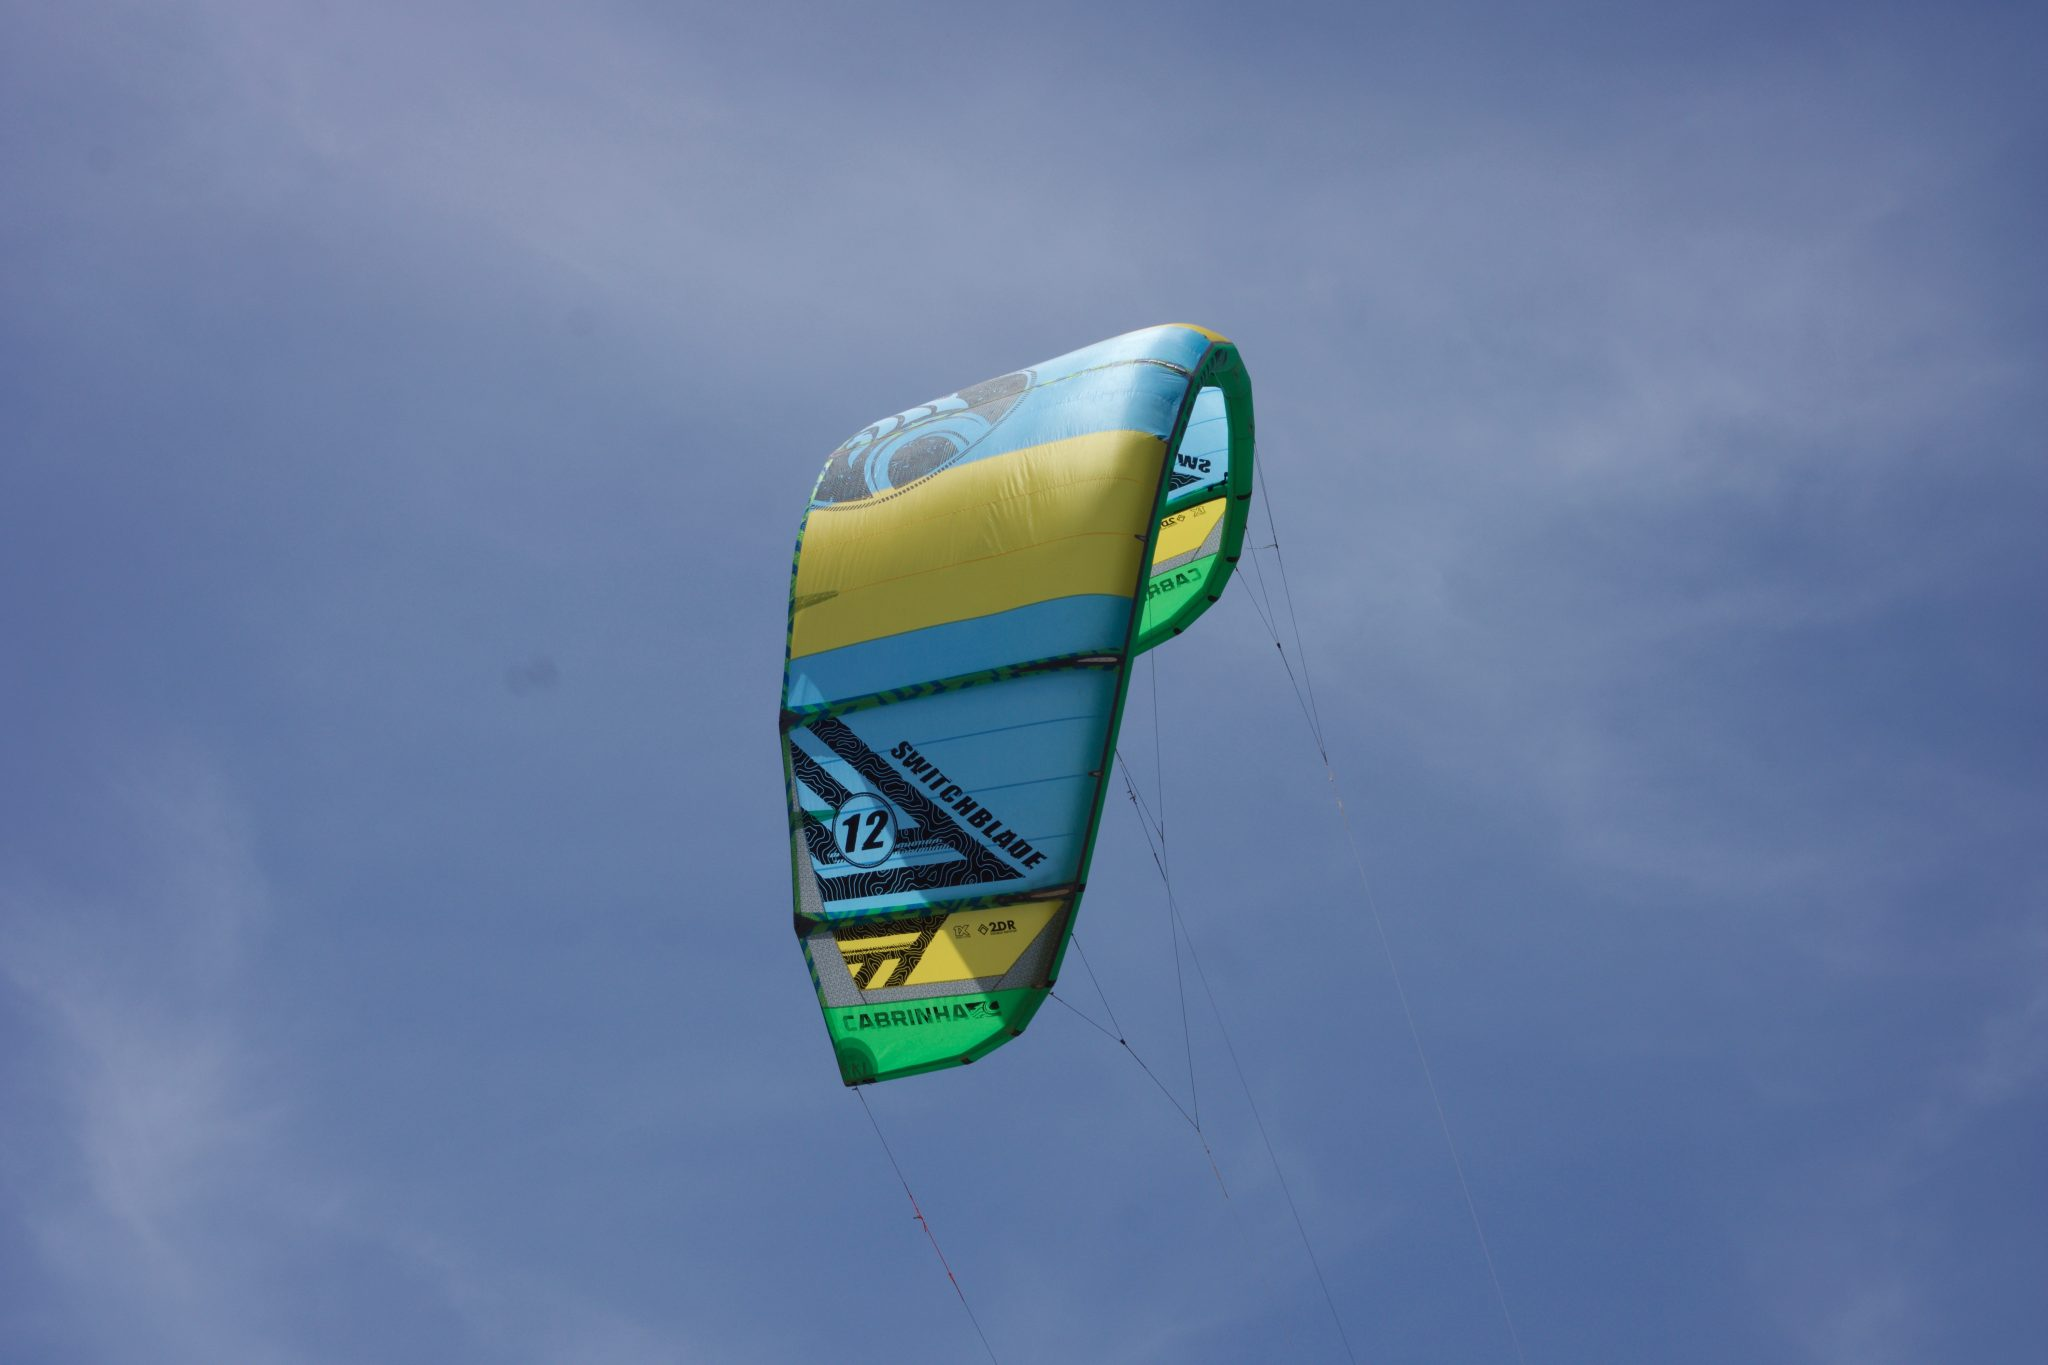 NEW DEALS on 2019 Cabrinha SWITCHBLADE Kites Kitesurf Kitesurfing